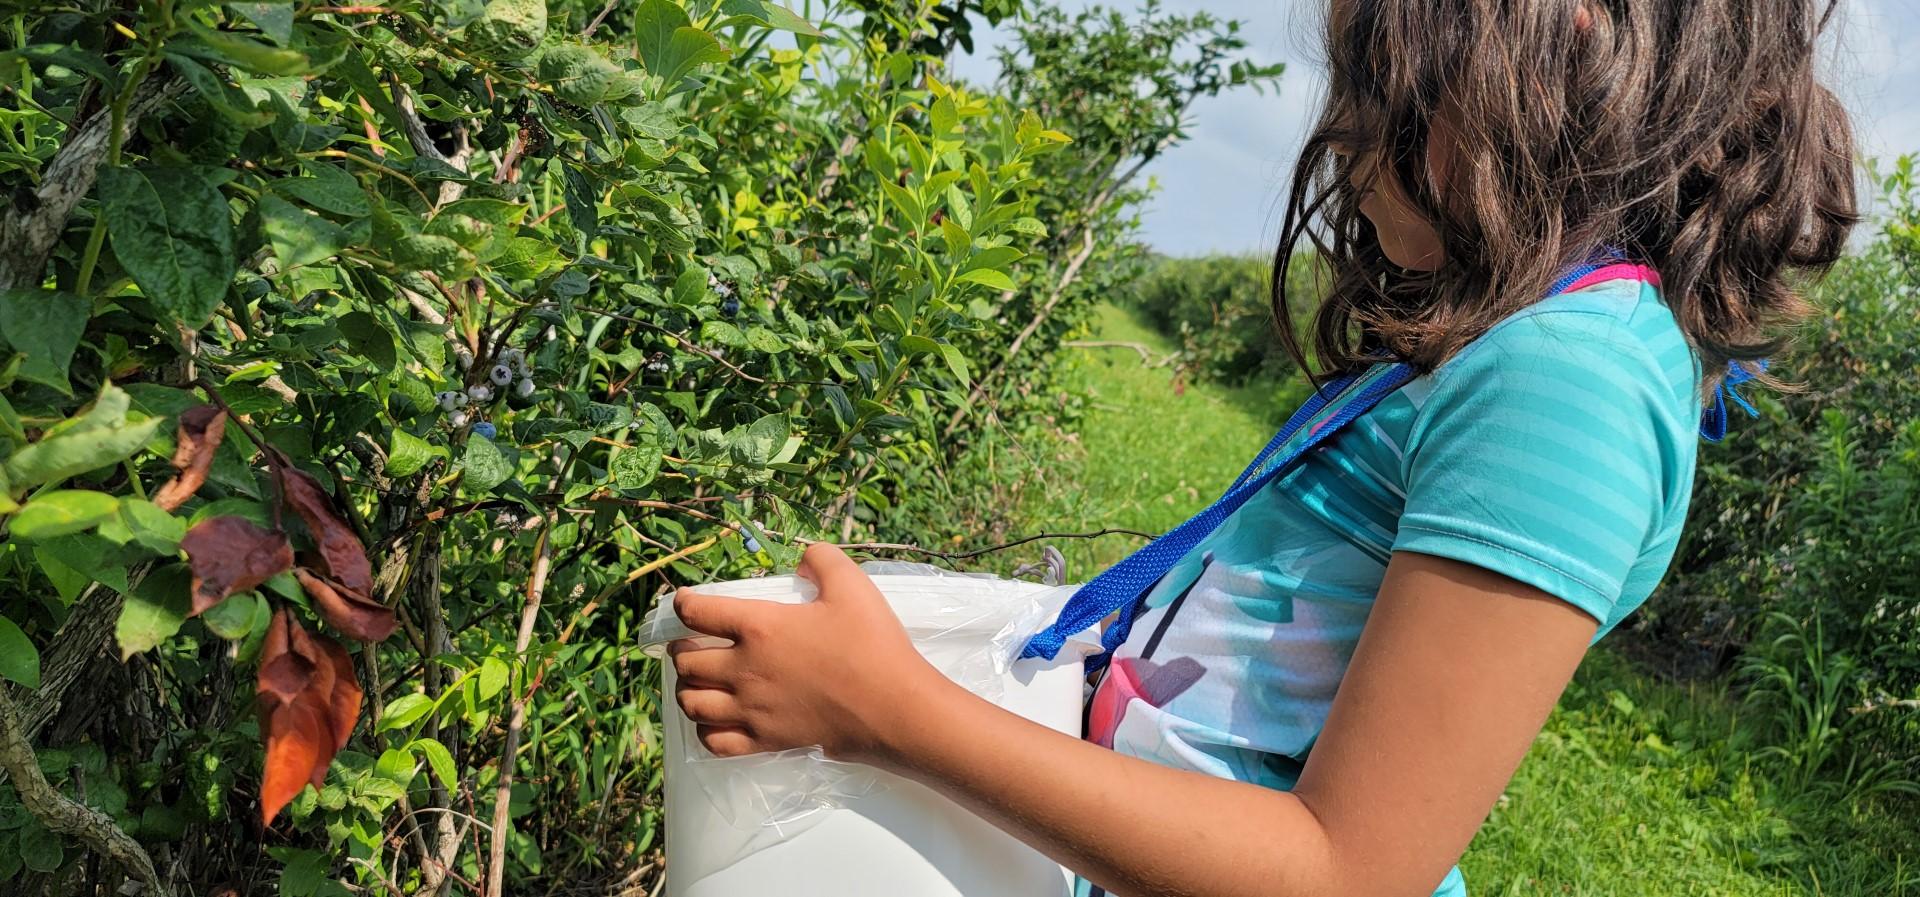 girl wearing white bucket picking blueberries